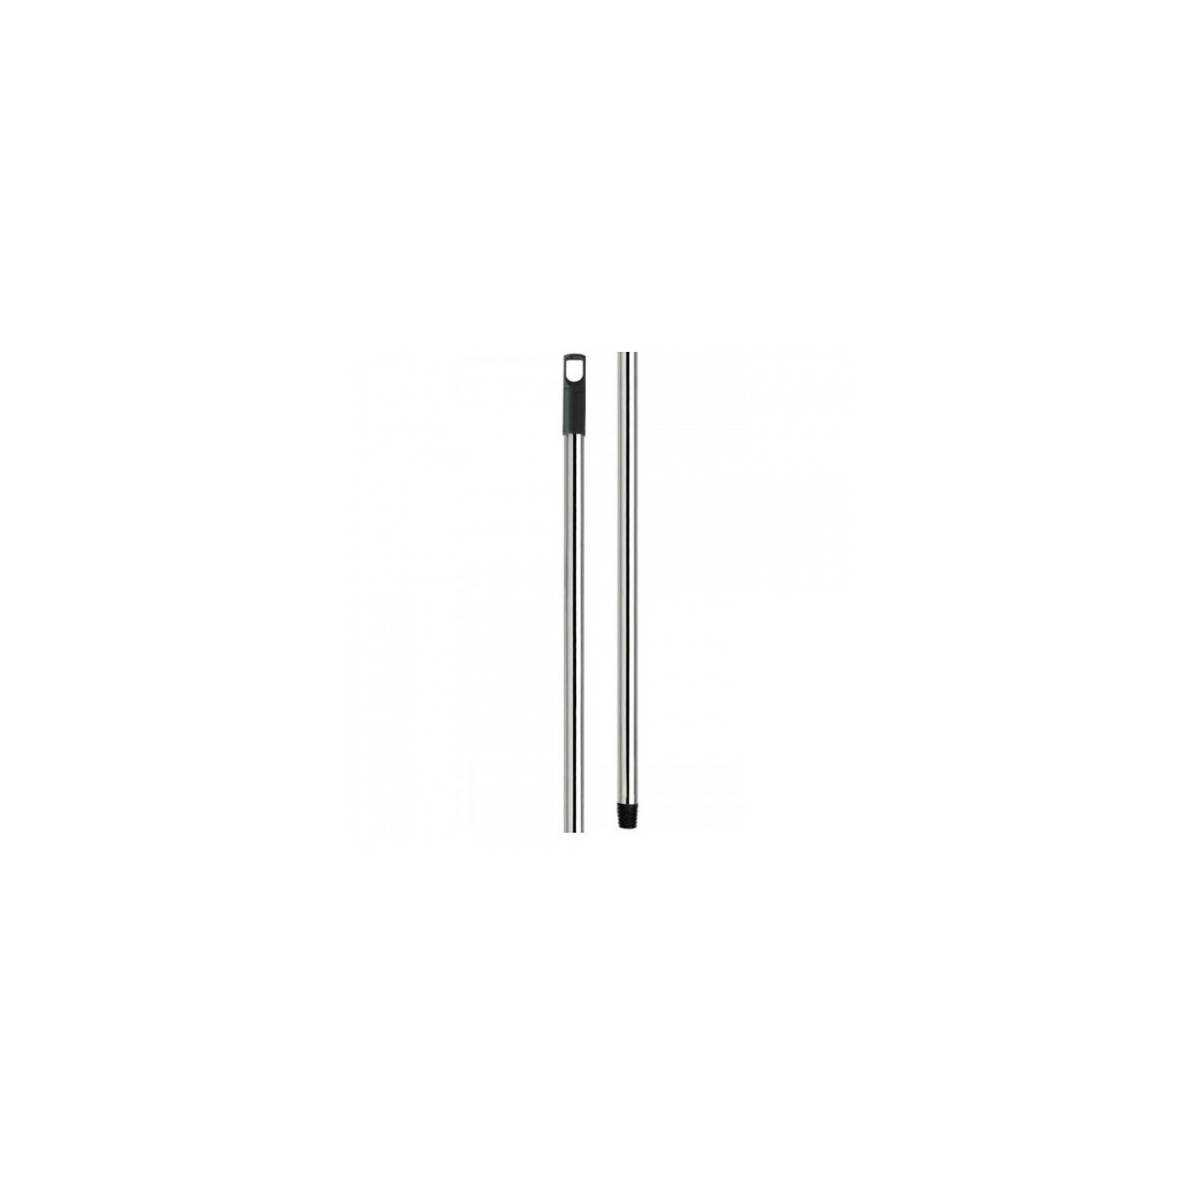 Рукоятка хромированная с резьбой 130см 11513 APEX - Fratelli Re SpA